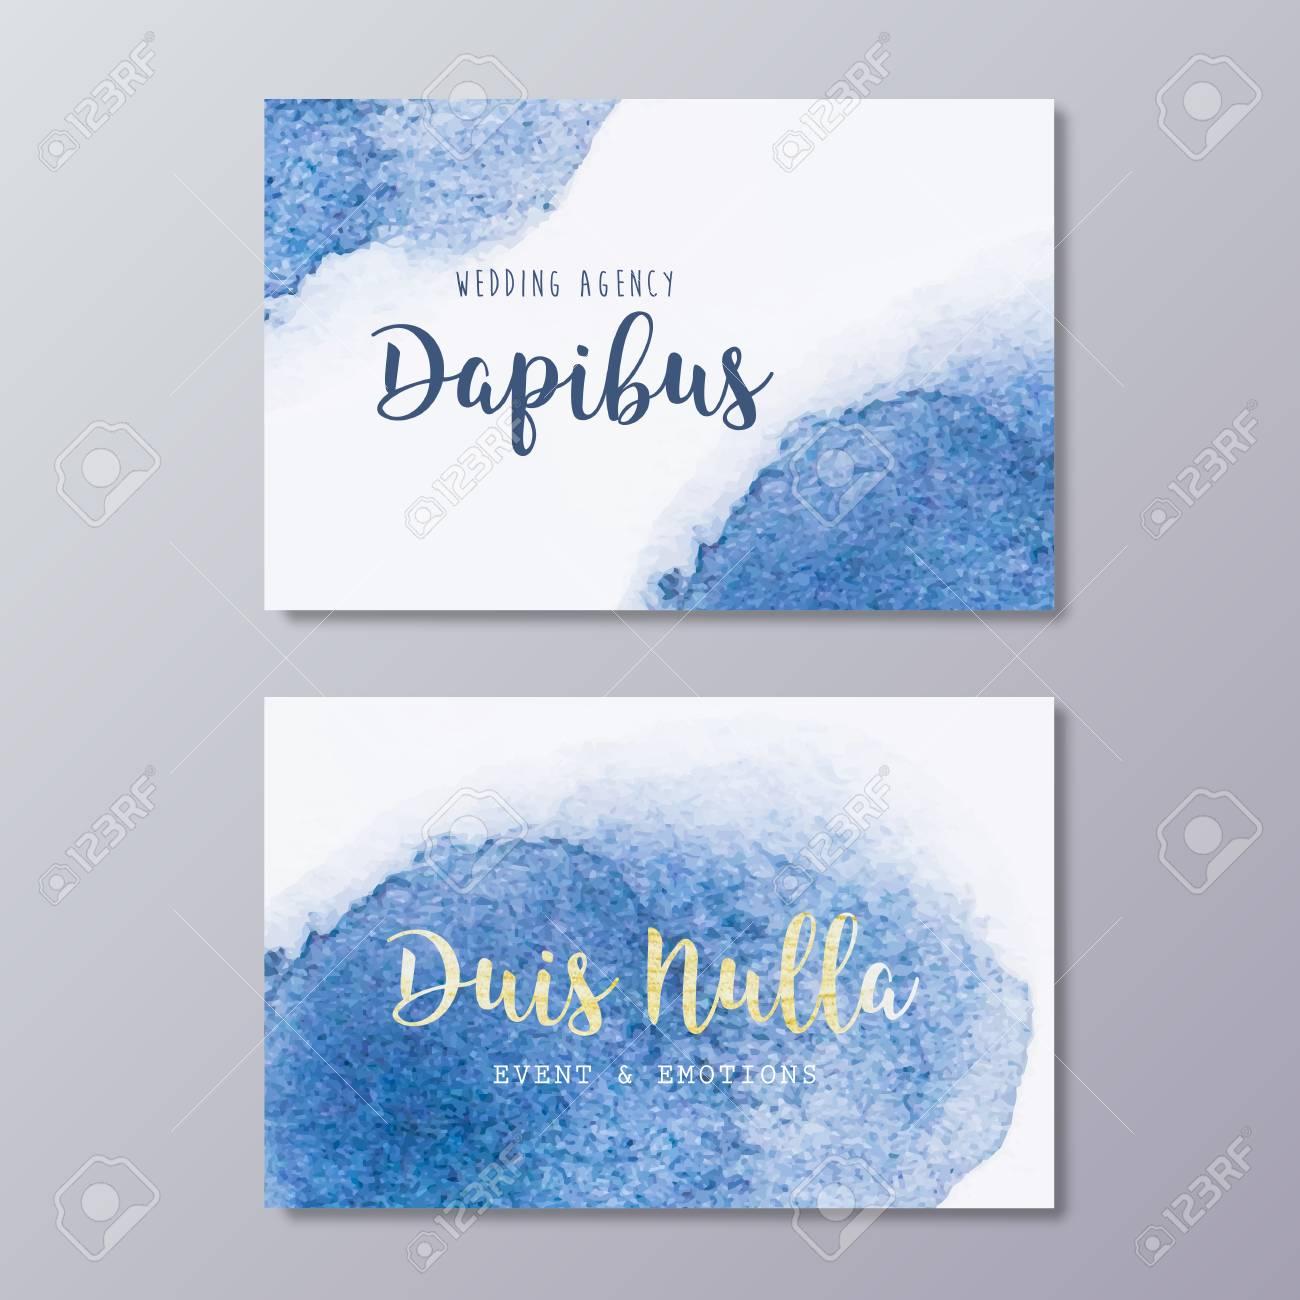 Premade wedding dress business card design vector templates premade wedding dress business card design vector templates hand drawn abstract blue watercolor spot texture colourmoves